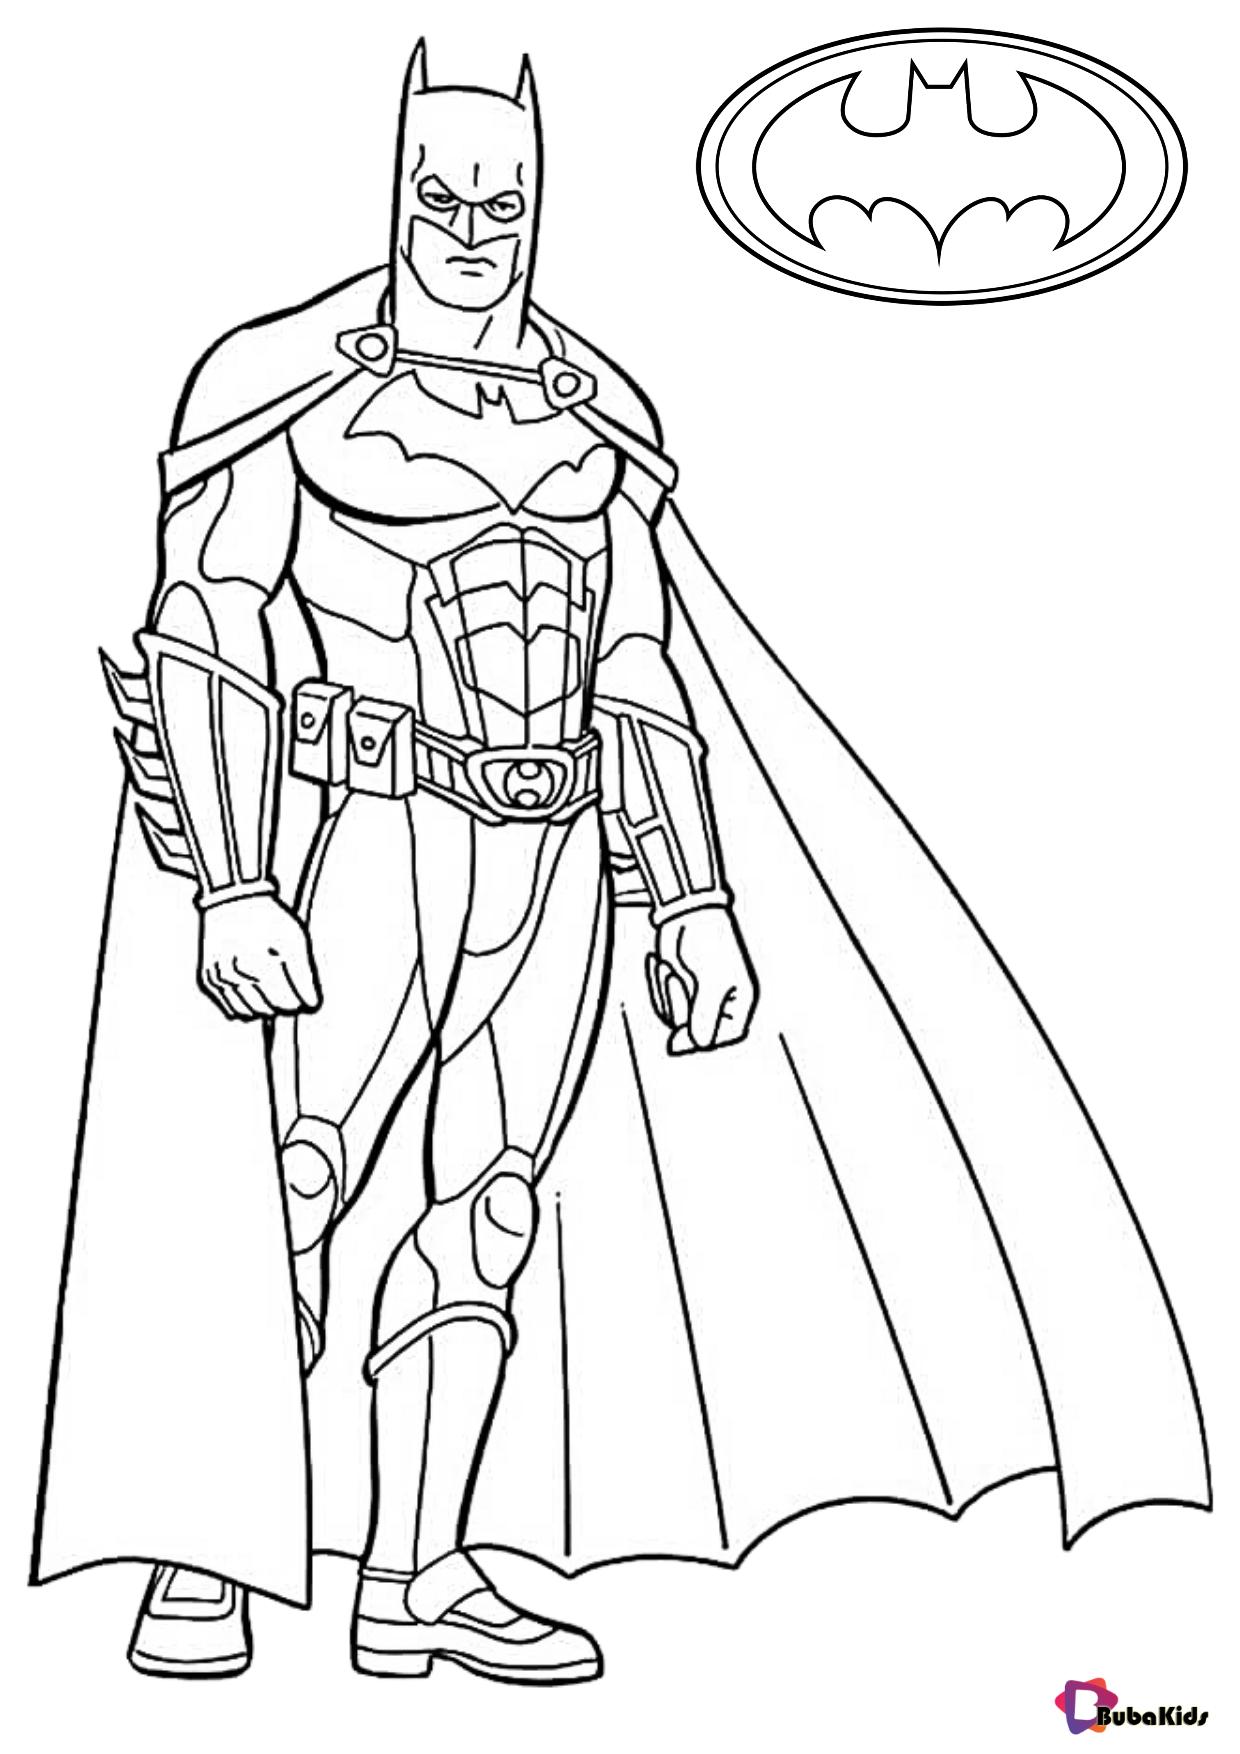 Free download Batman superhero coloring sheet for kids Wallpaper